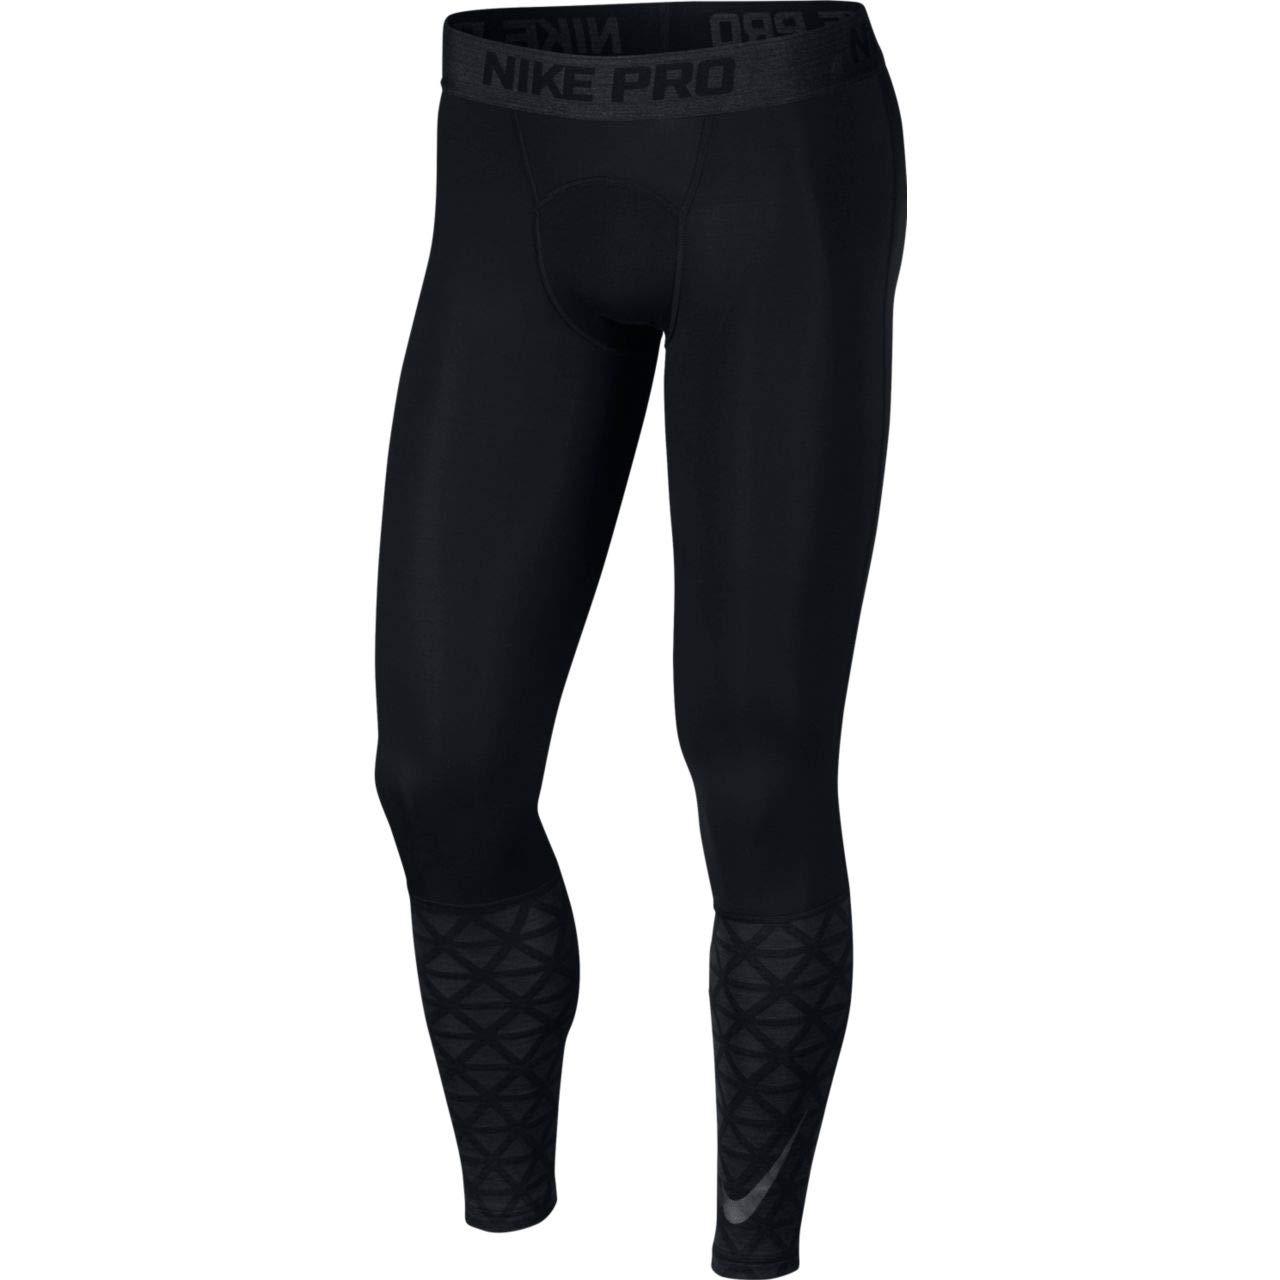 Nike Men's Pro Tights, Black/Anthracite/Black, Small